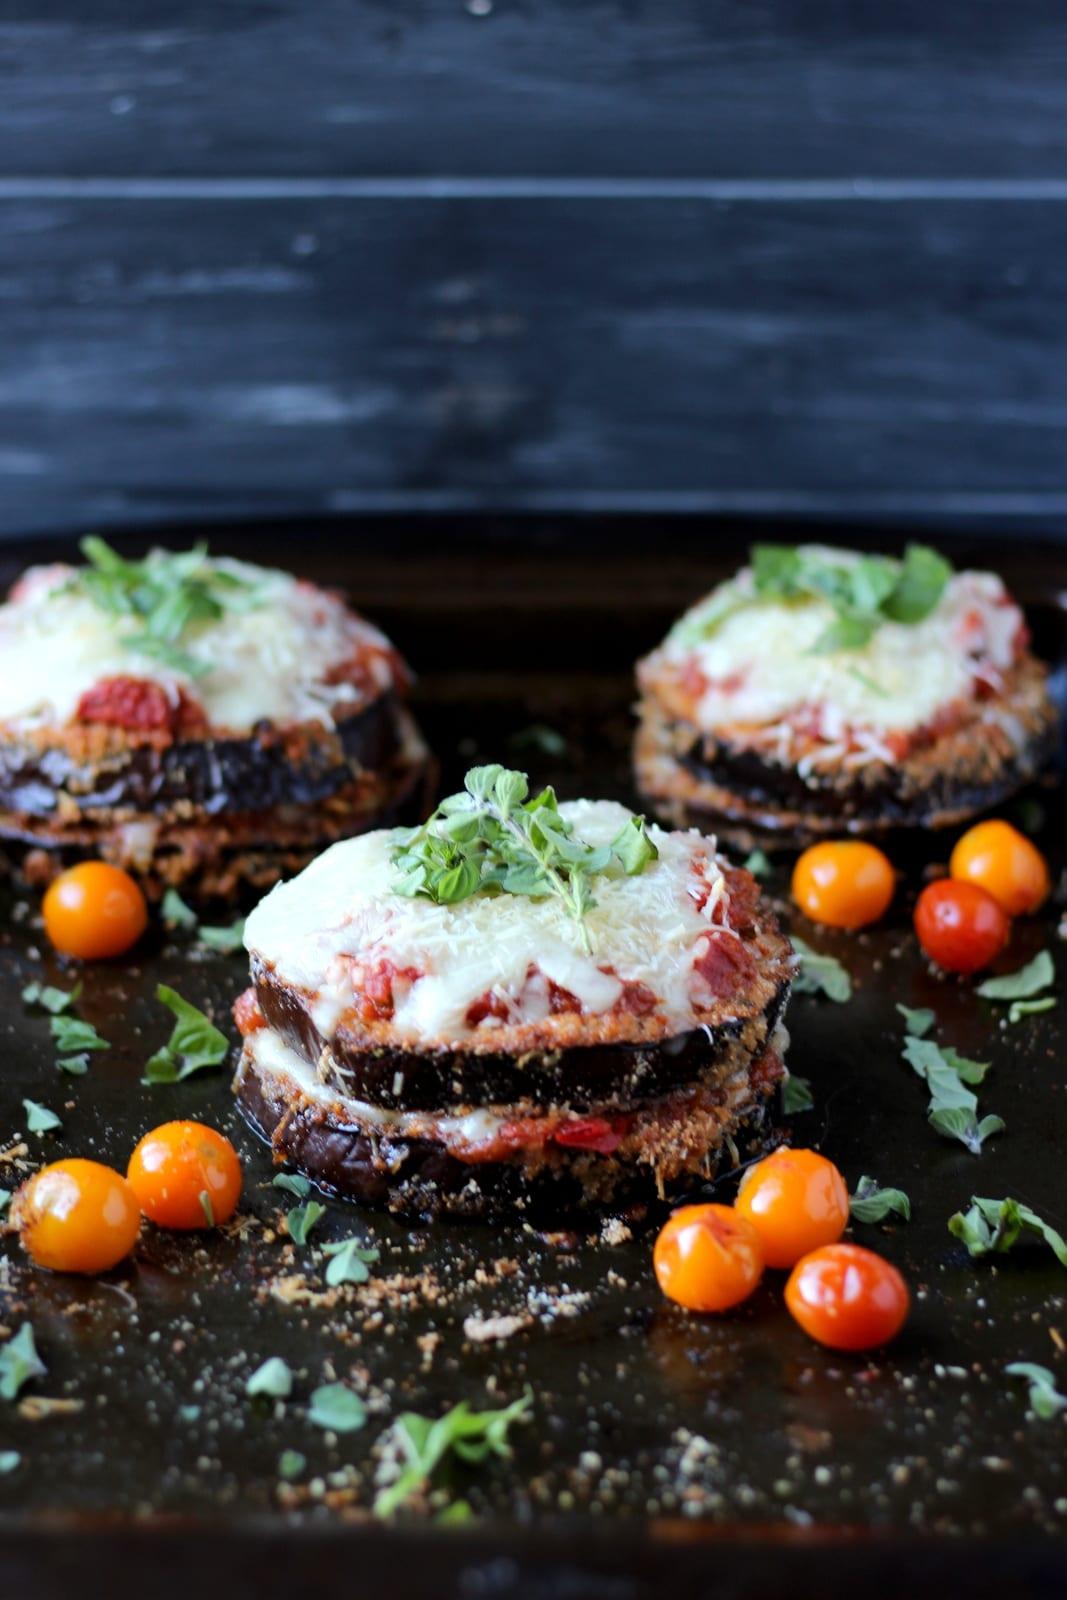 Baked Eggplant Parmesan - thewoodenskillet.com #meatless #eggplant #healthy